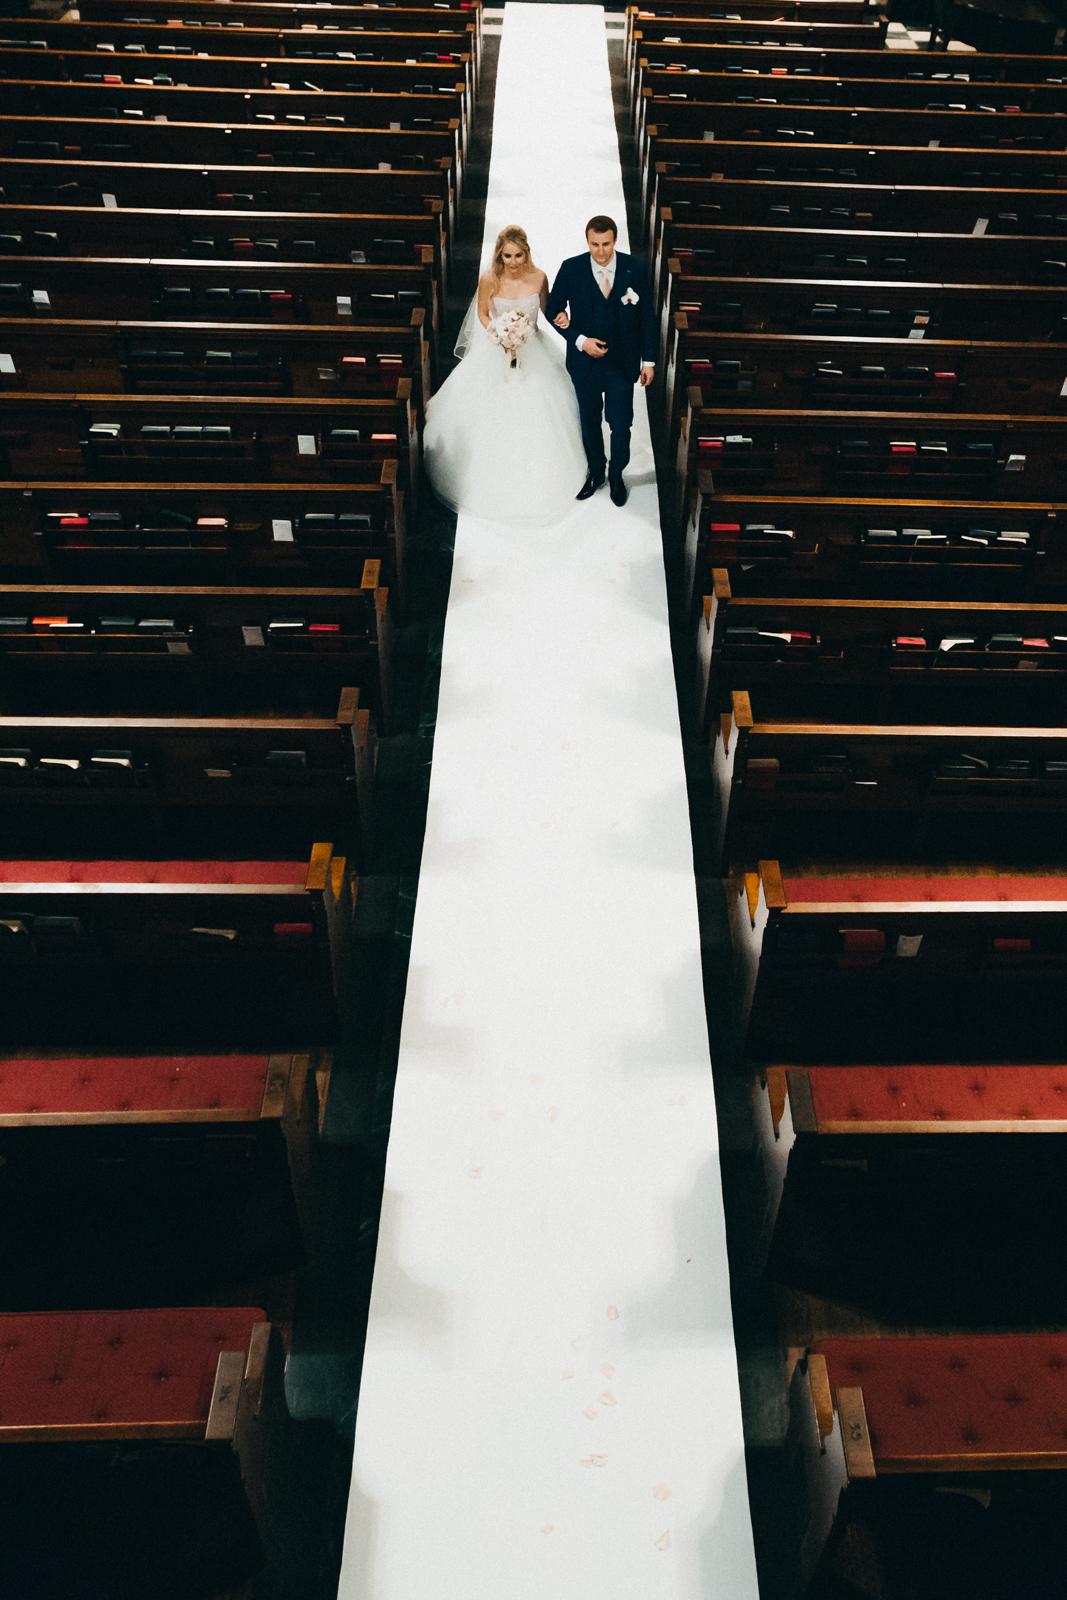 NYC Wedding Photography Sofitel Central Park Brooklyn Photographer Boris Zaretsky _B2C2420.jpg